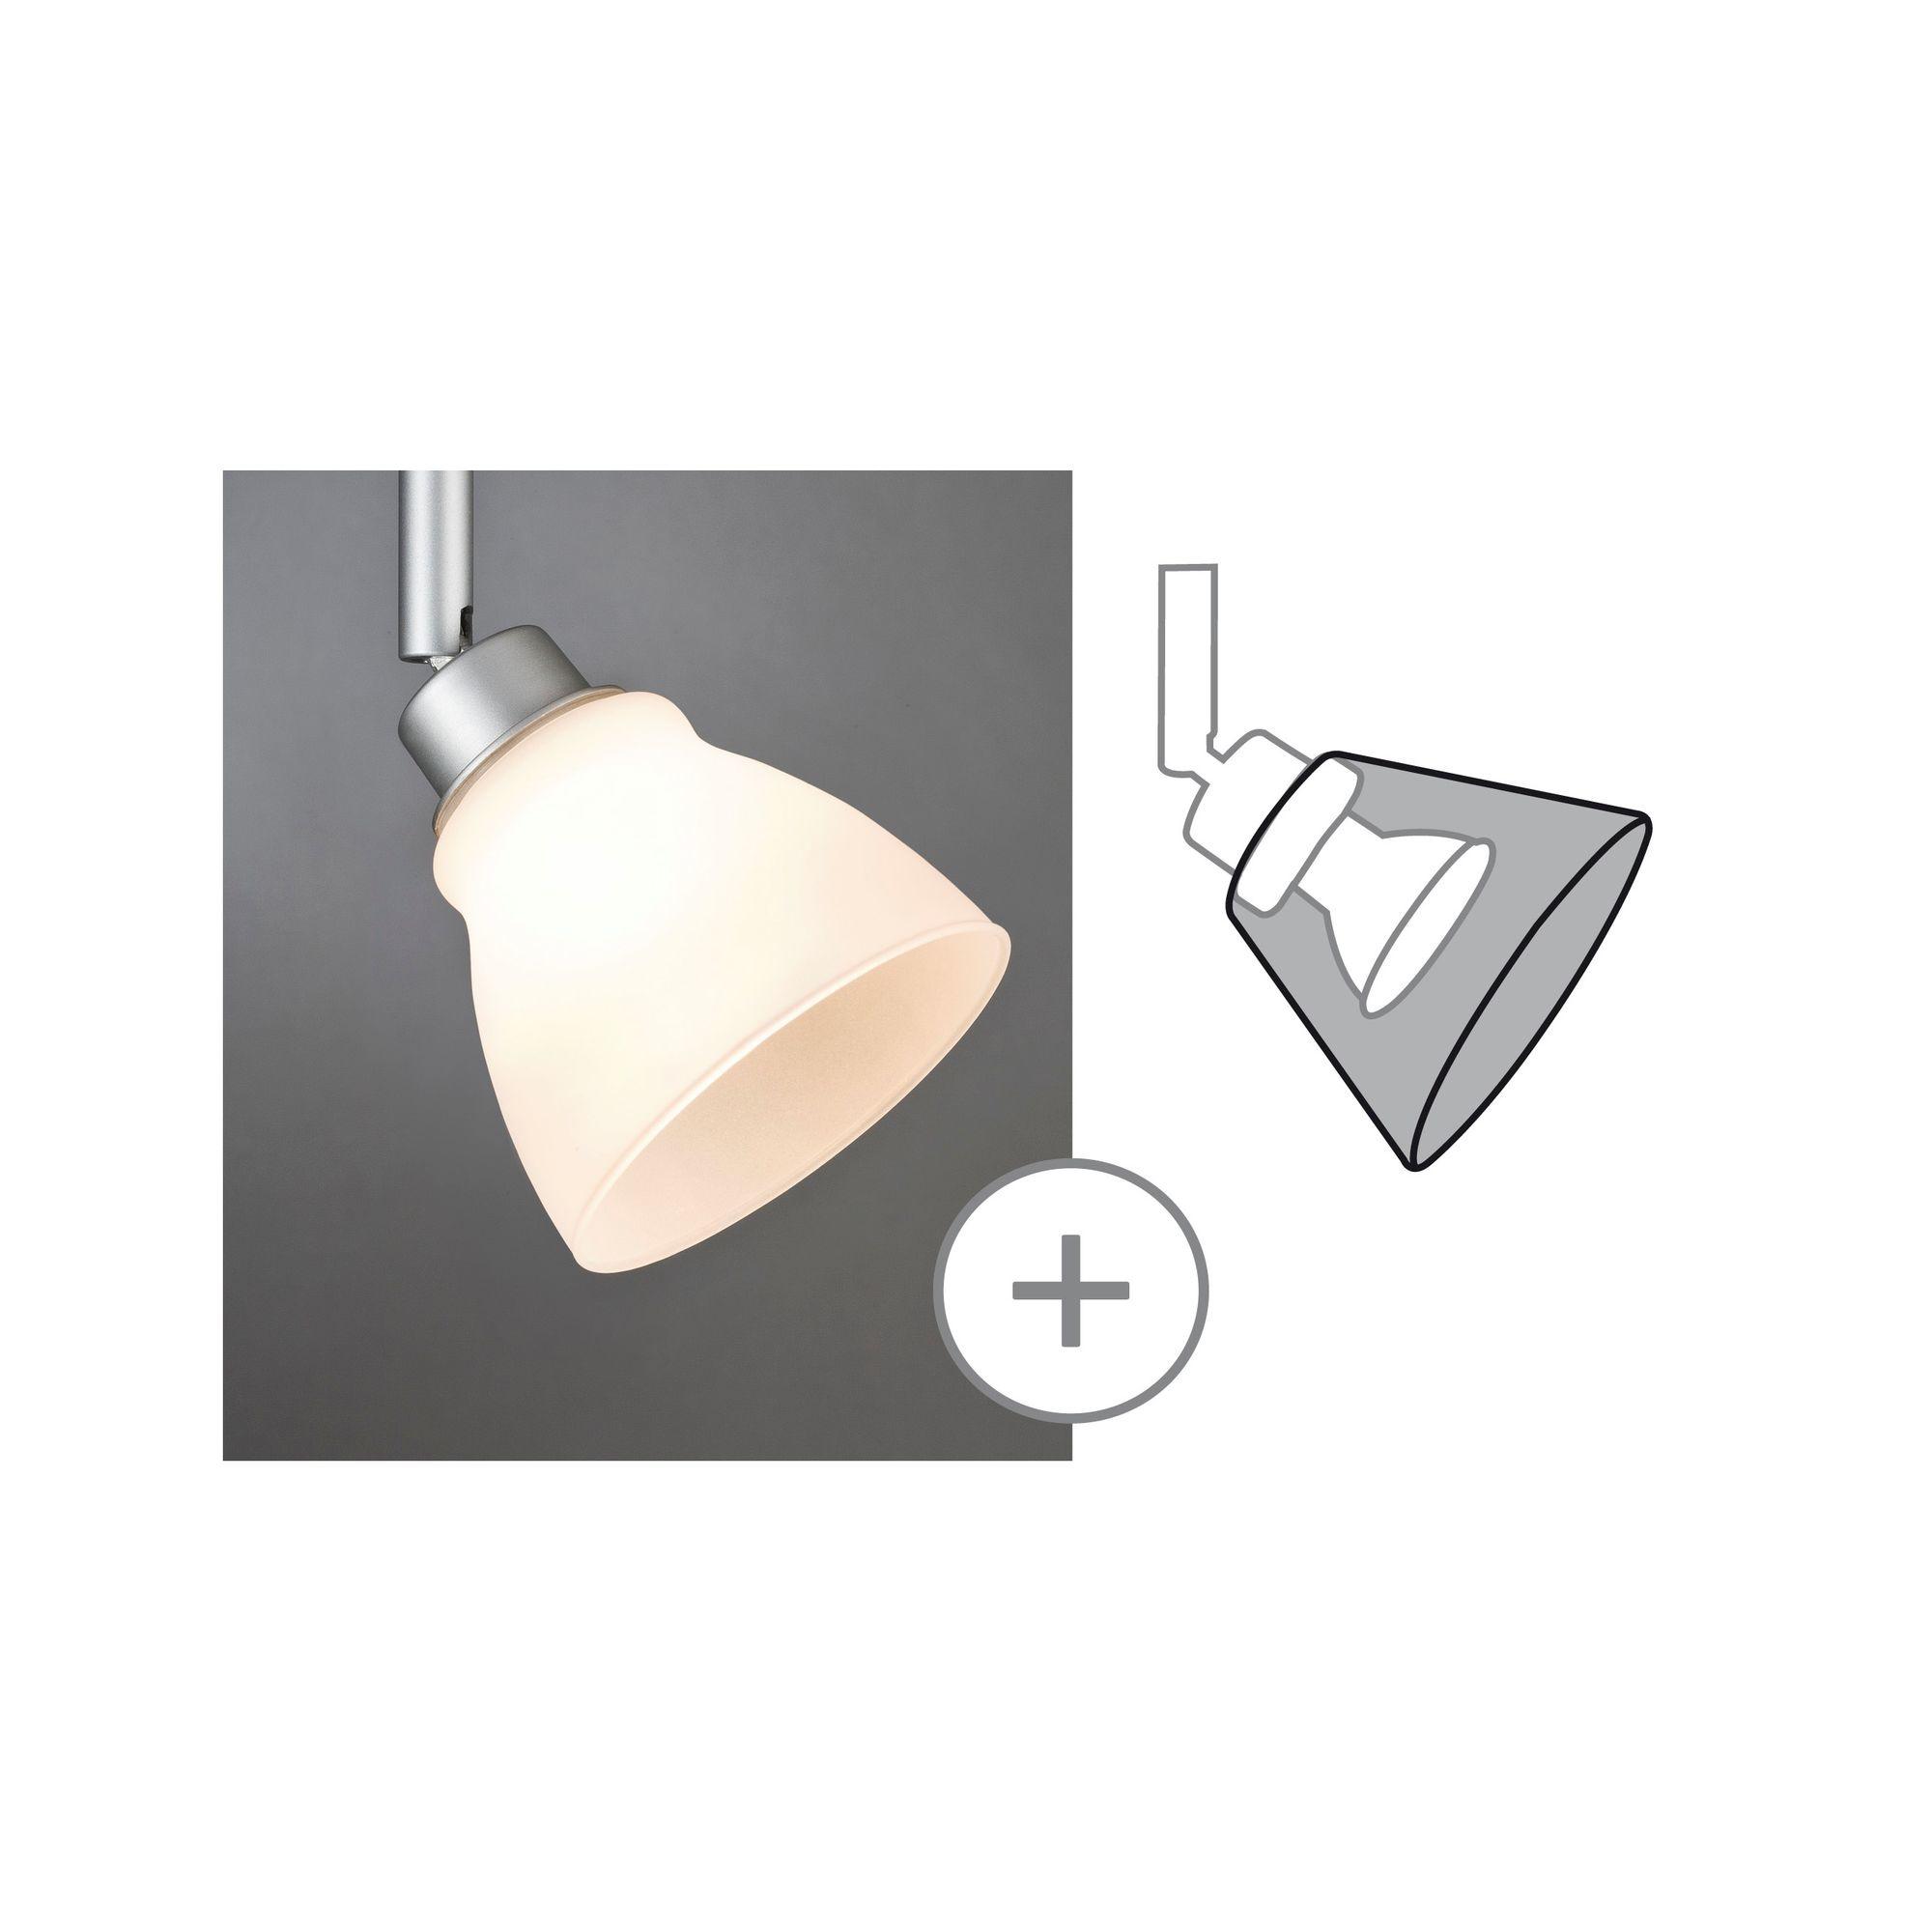 Paulmann DecoSystems Schirm Wolbi max.50W Glas Weiß